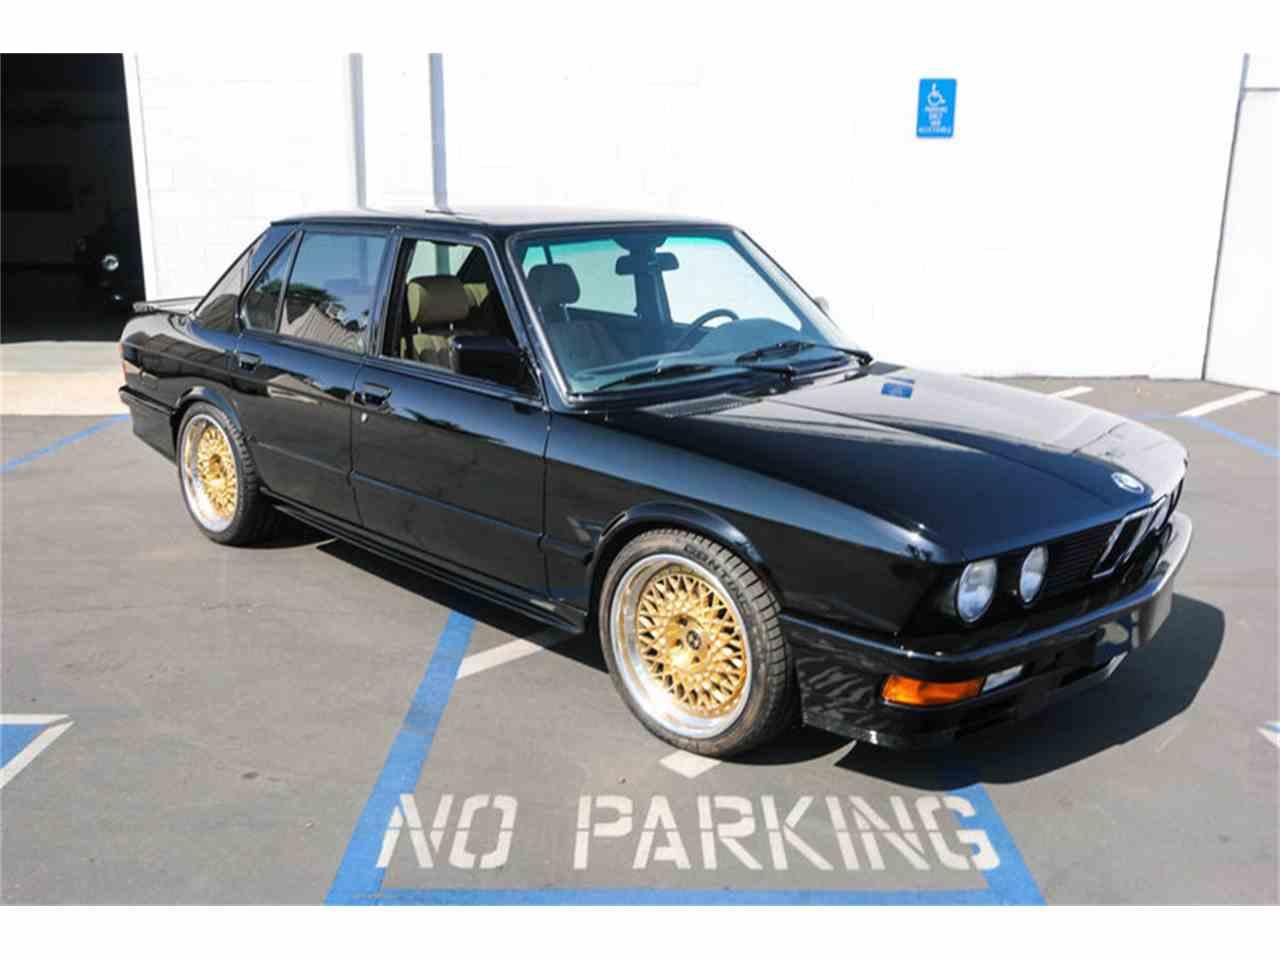 BMW M For Sale ClassicCarscom CC - 1988 bmw m5